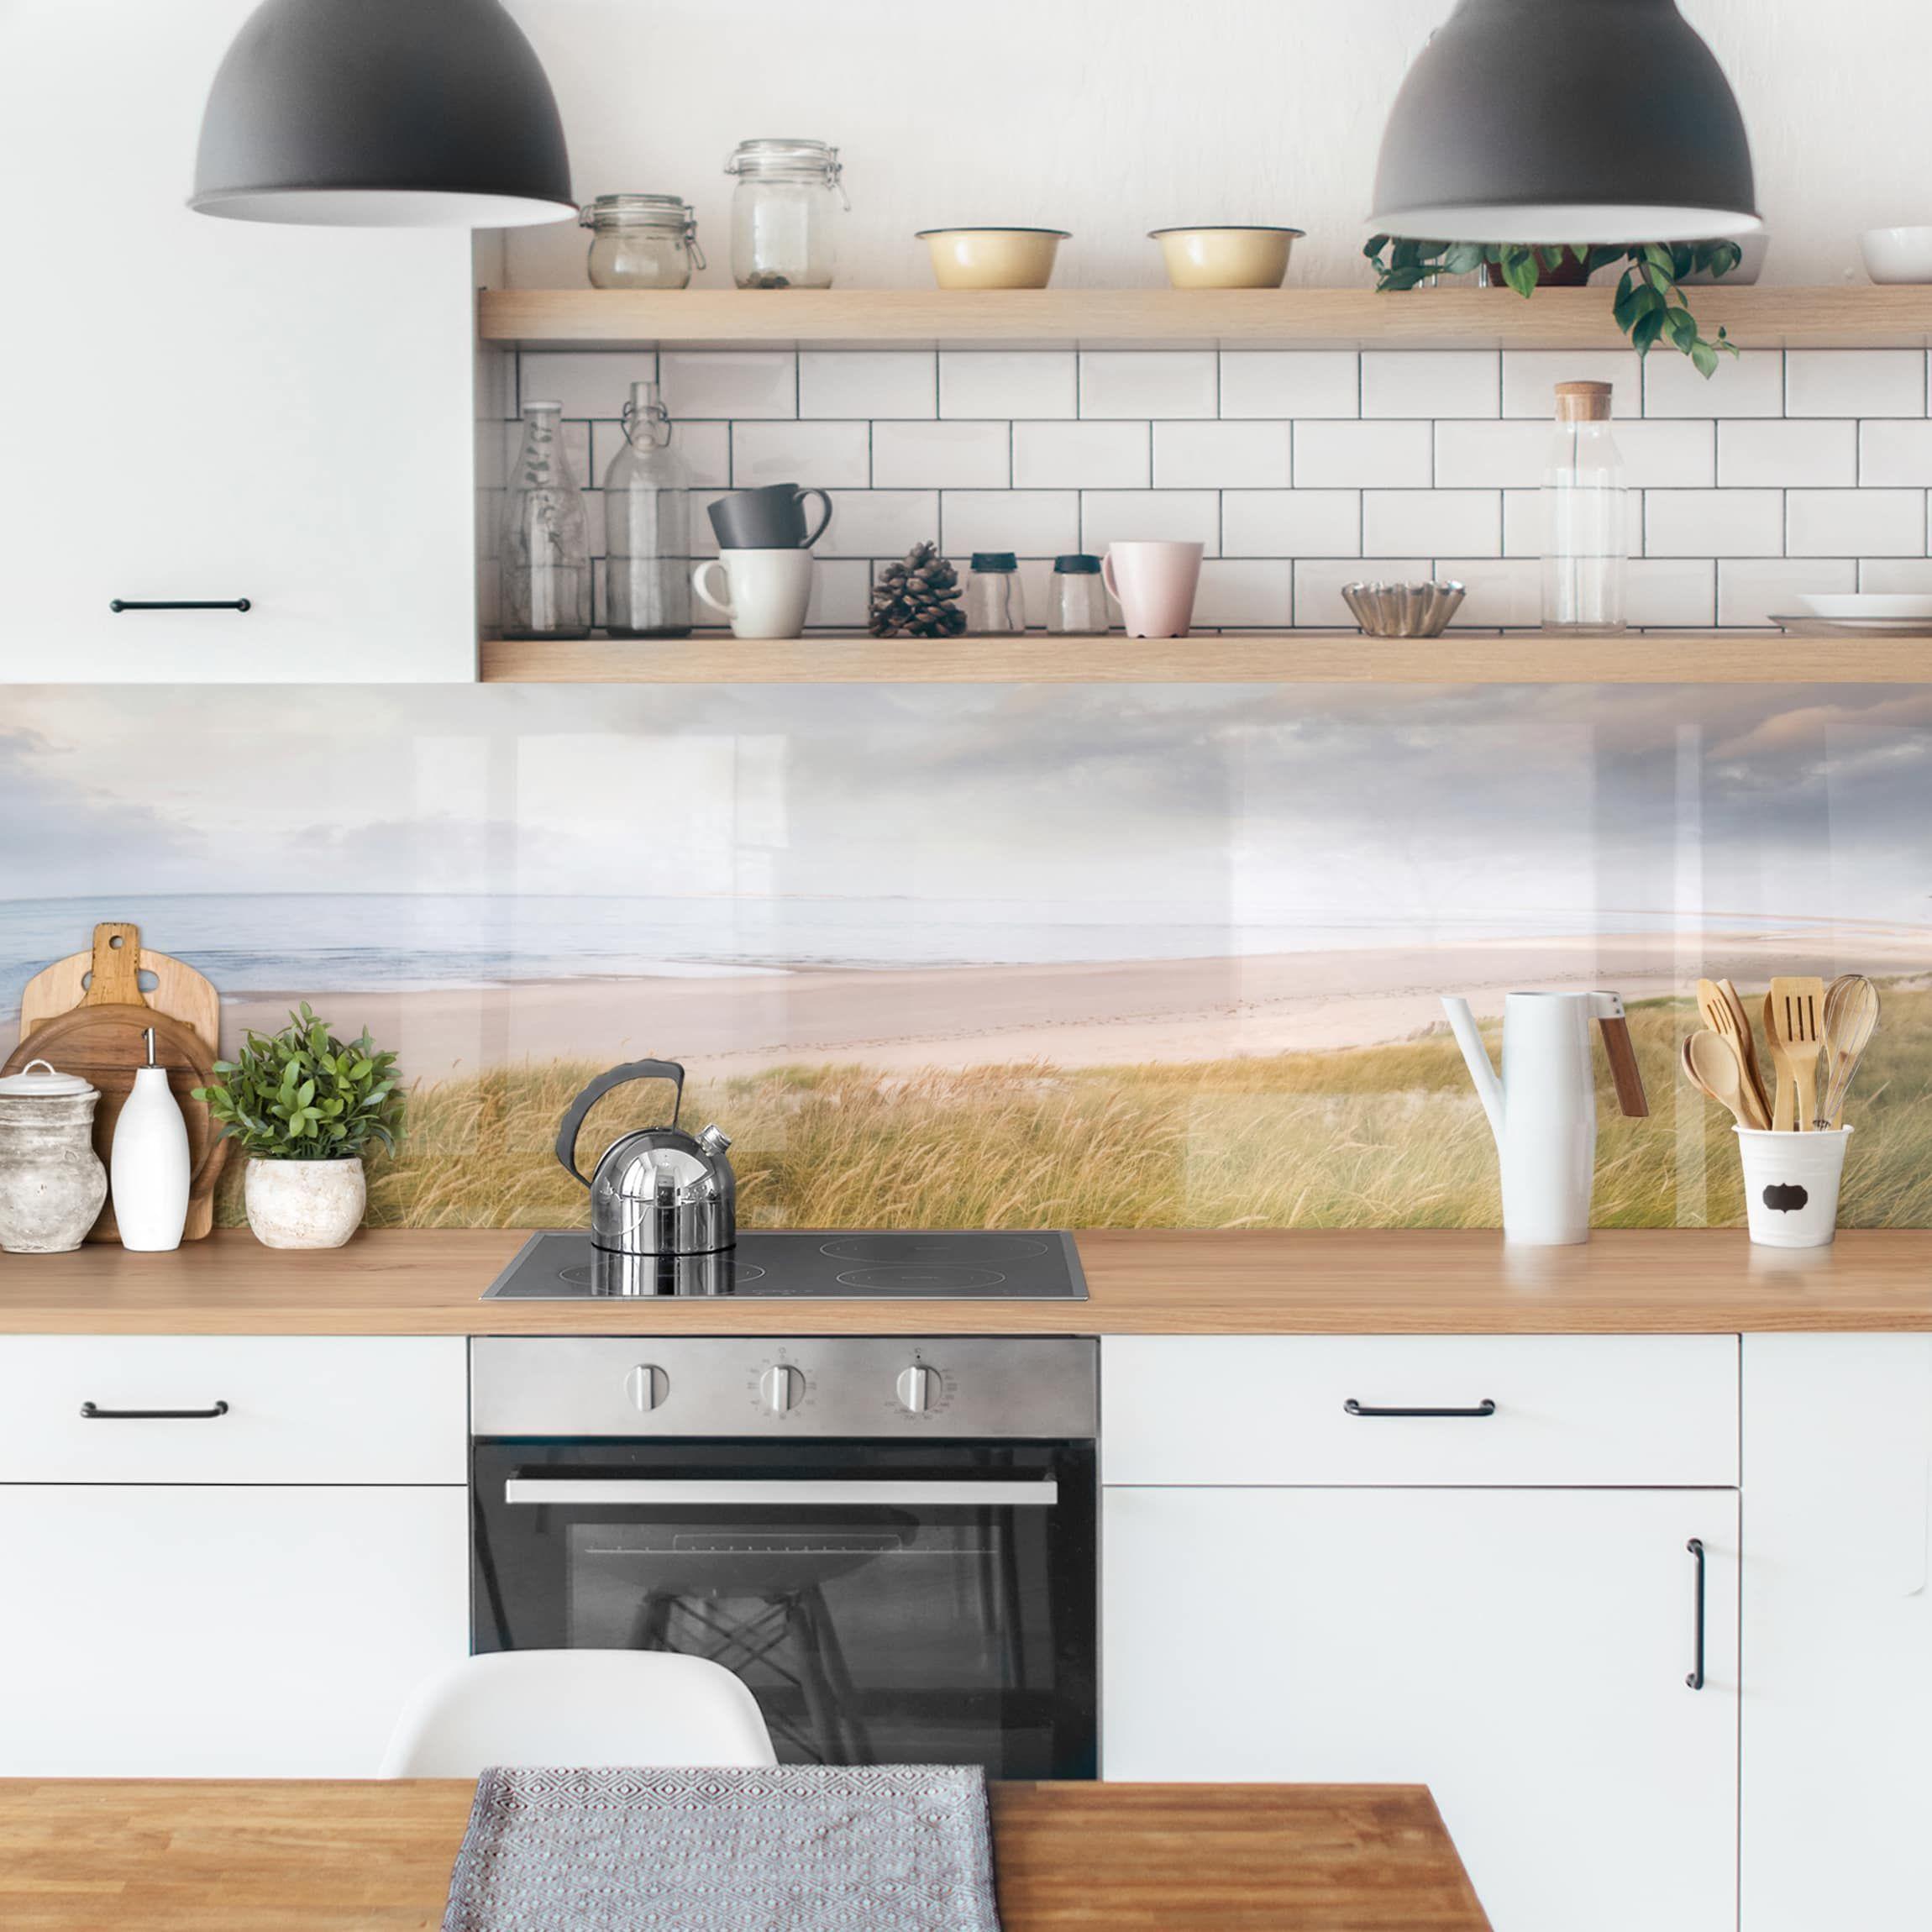 Kuchenruckwand Dunentraum In 2020 Kuchenruckwand Kuchenprodukte Fliesenspiegel Kuche